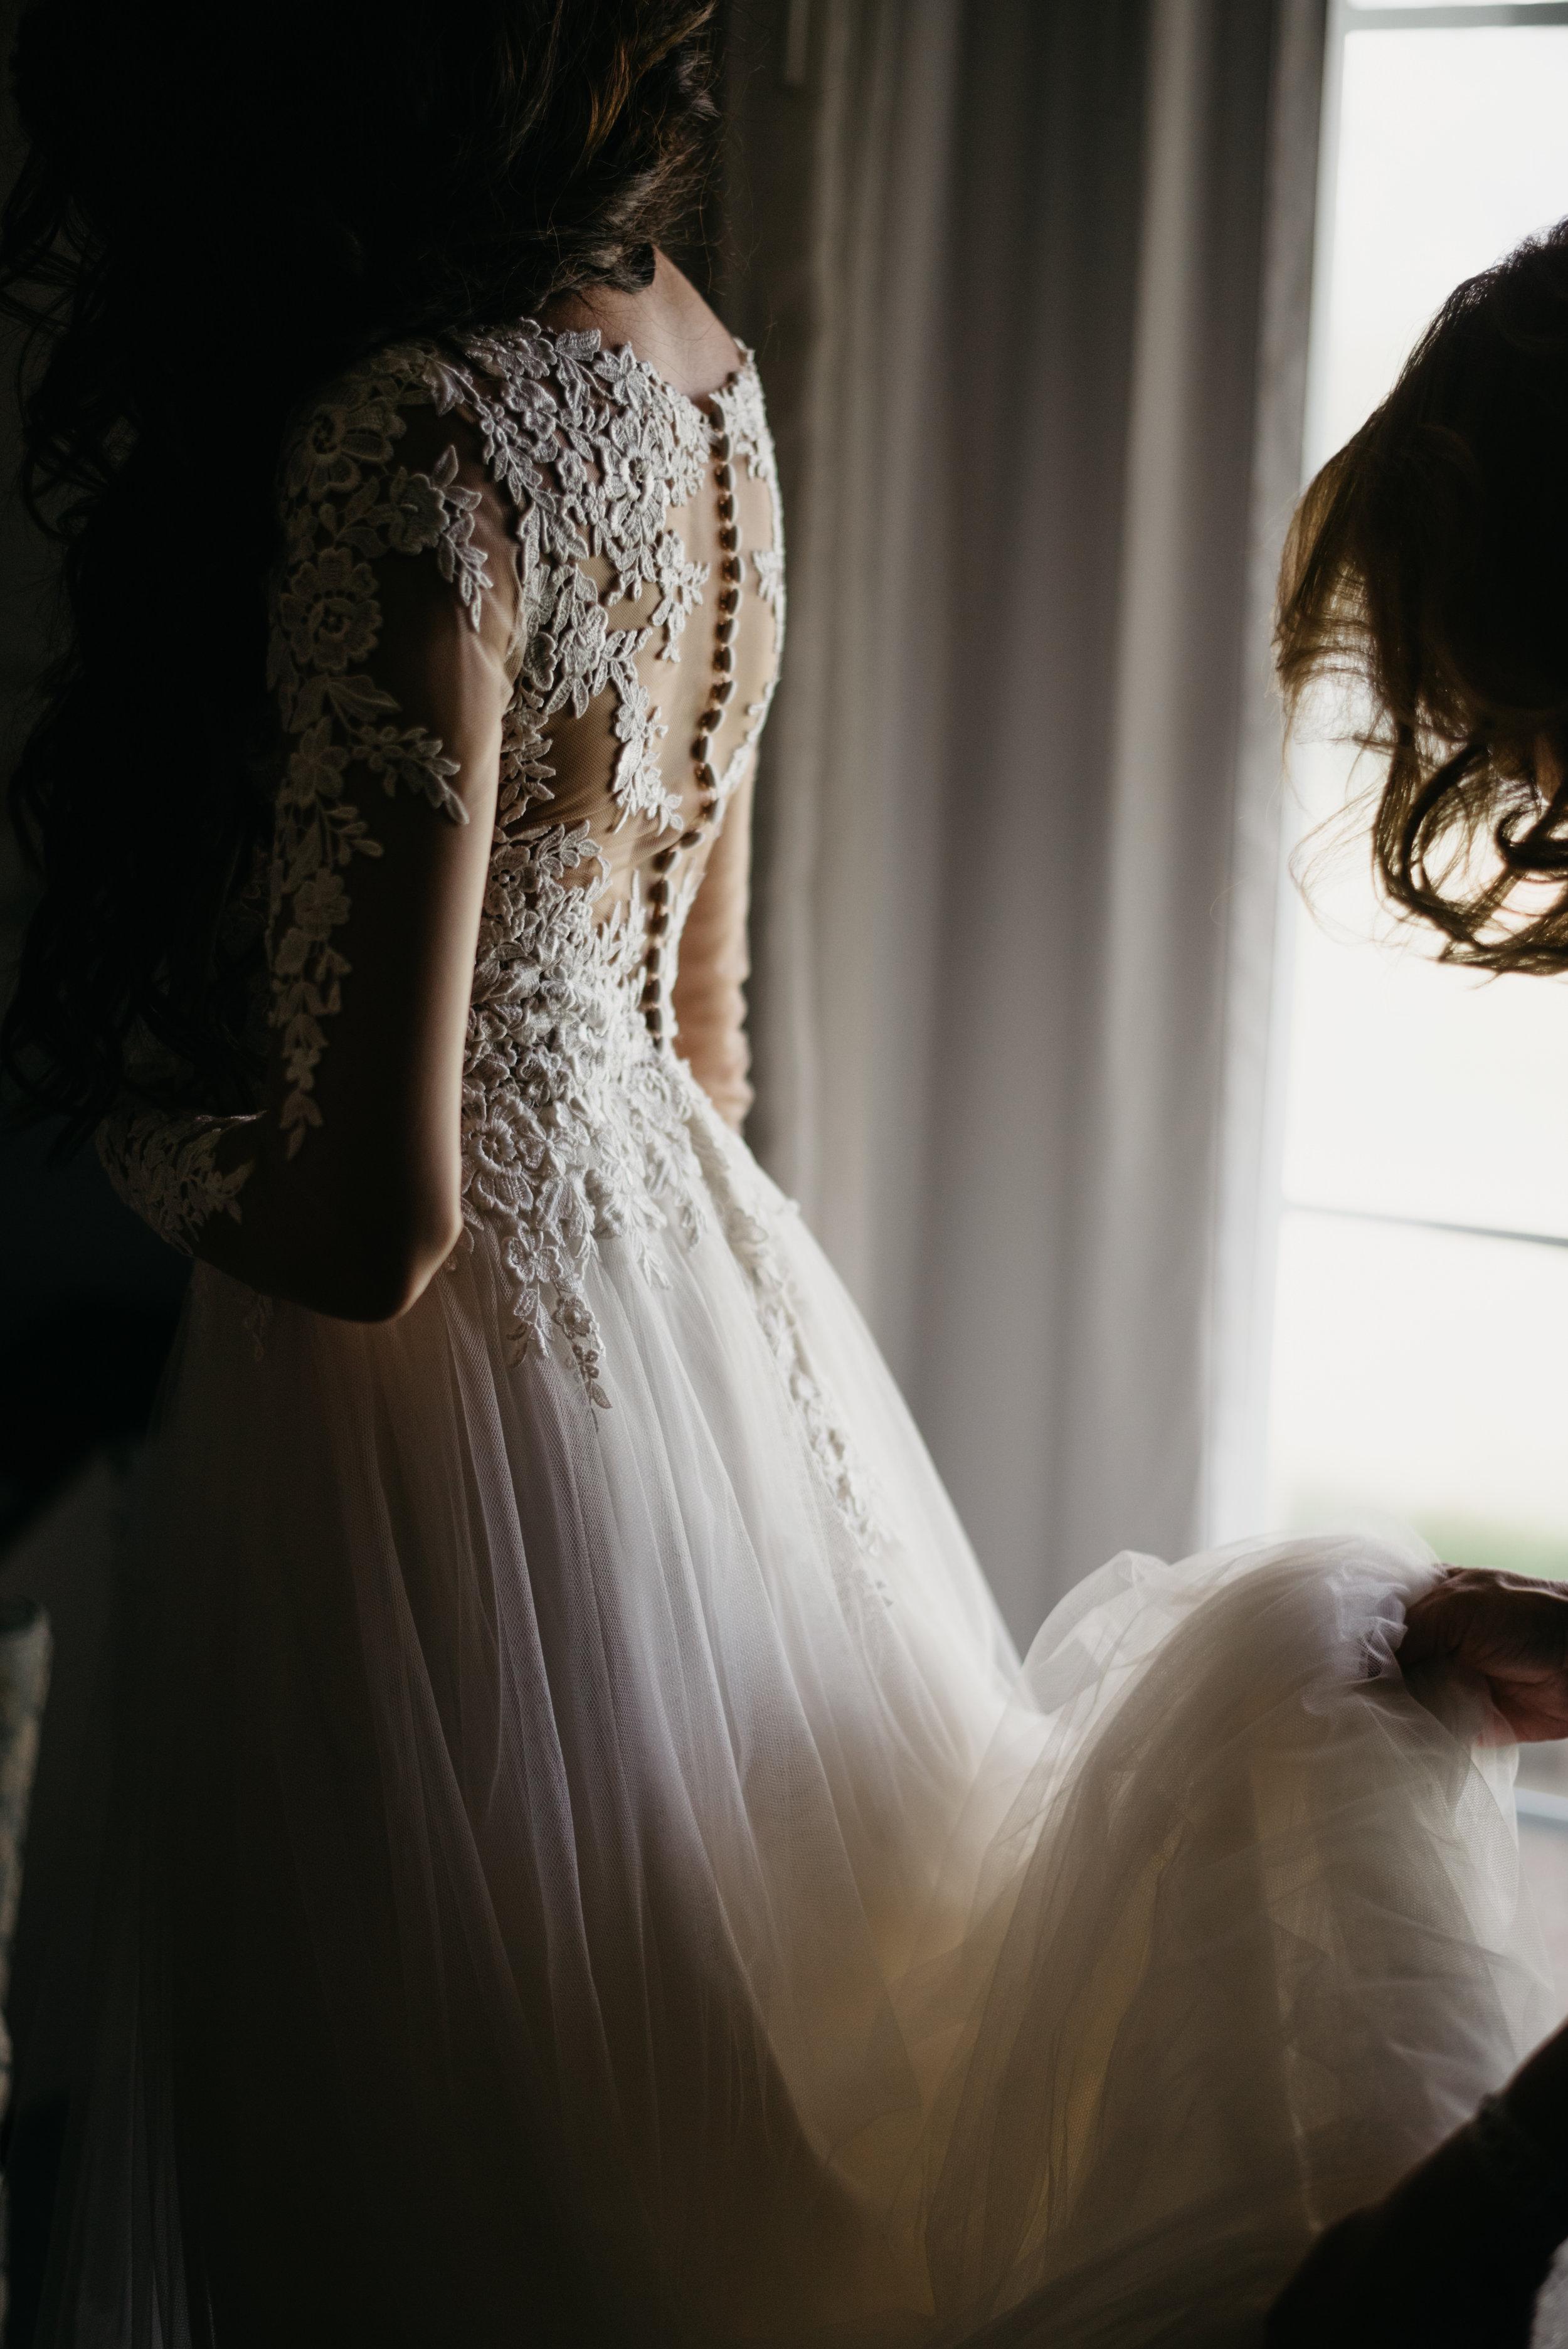 Barch-Massachusetts-Lakeside Tent Wedding-Western Massachusetts Wedding Photographer-00354.jpg